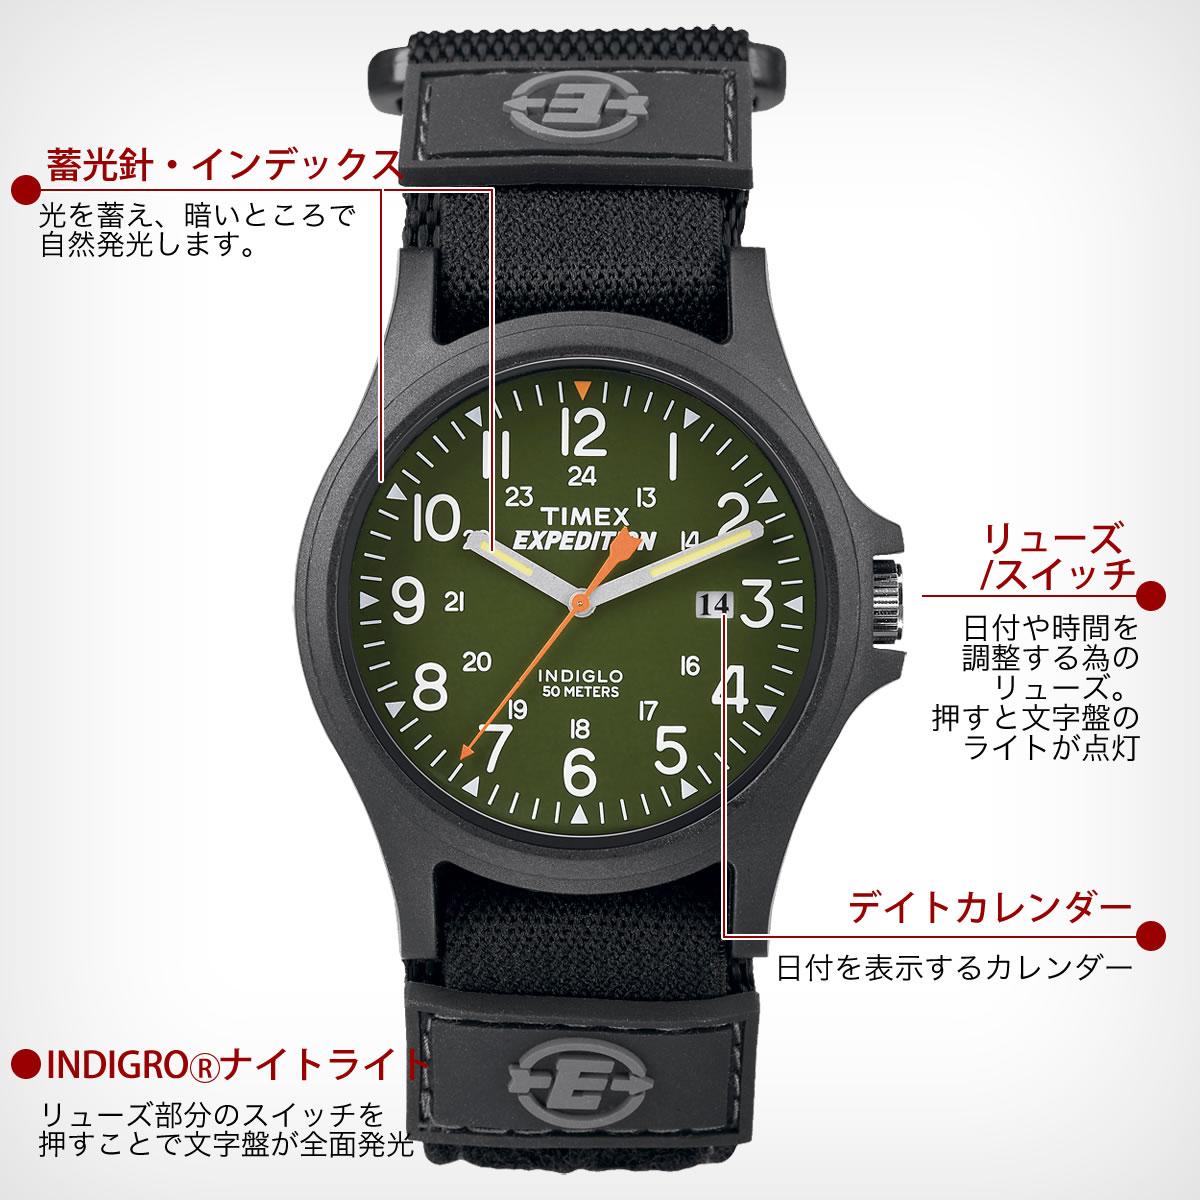 TIMEX Expedition  ACADIA カーキ×ブラック 41mm TW4B00100 機能詳細